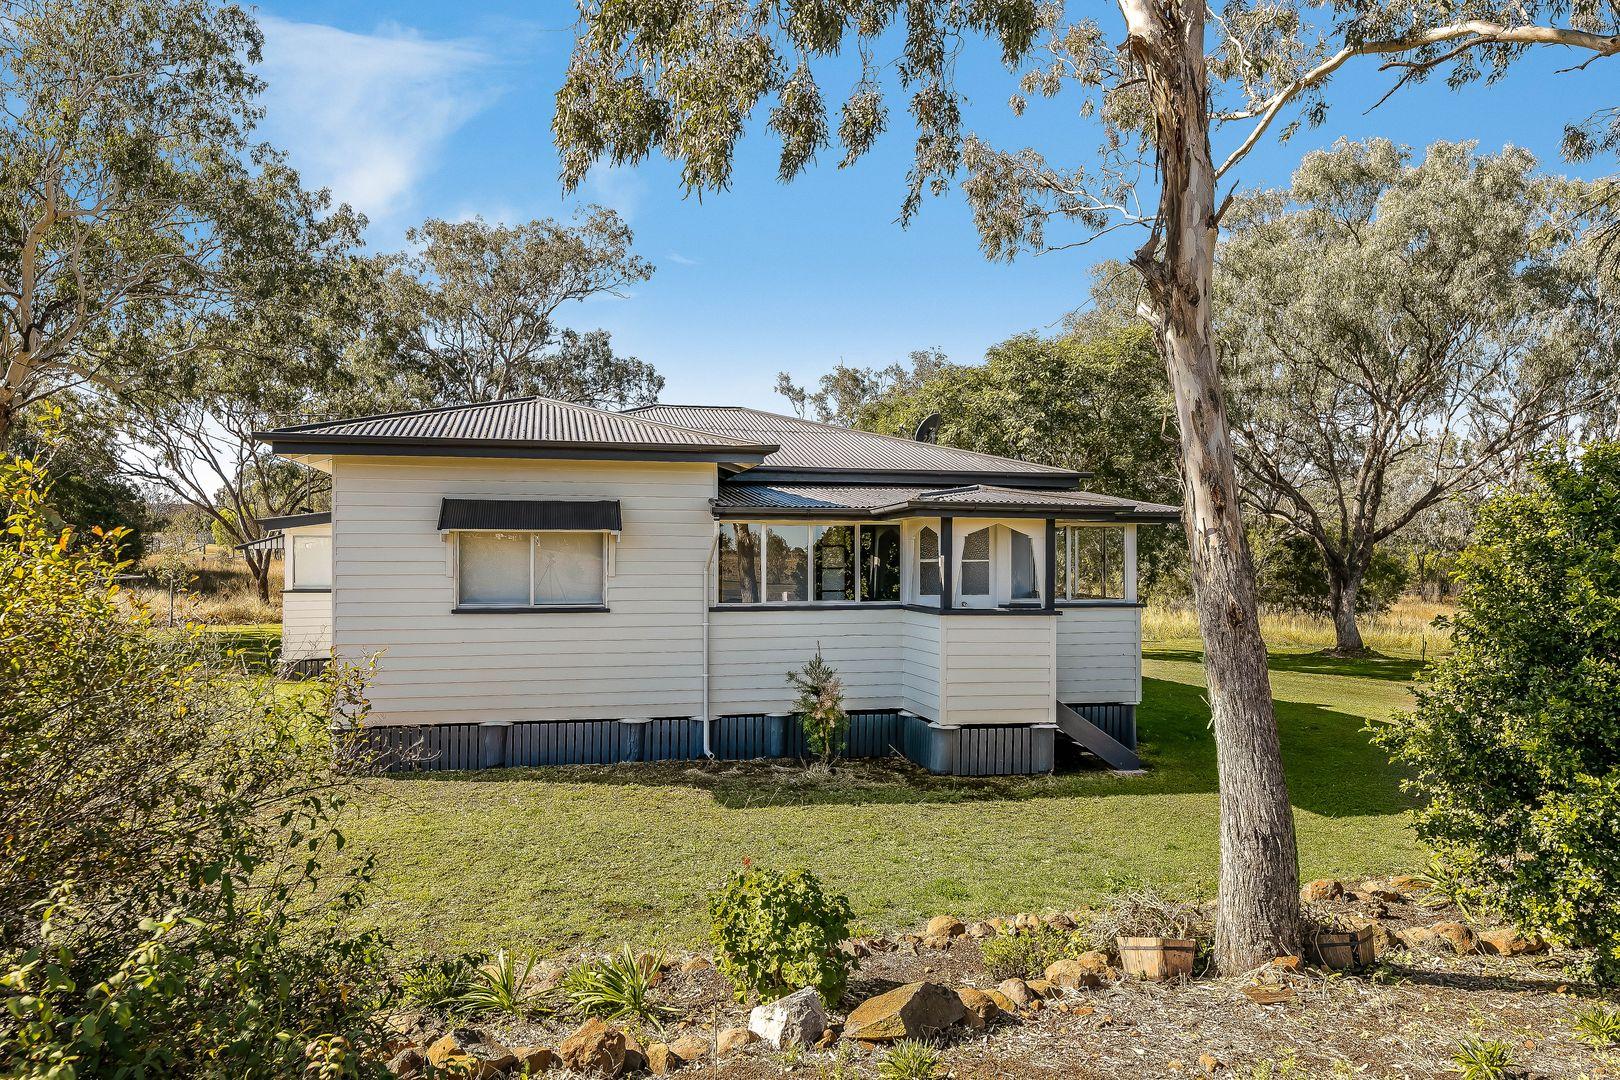 3297 Oakey Road, Springside, Pittsworth QLD 4356, Image 0